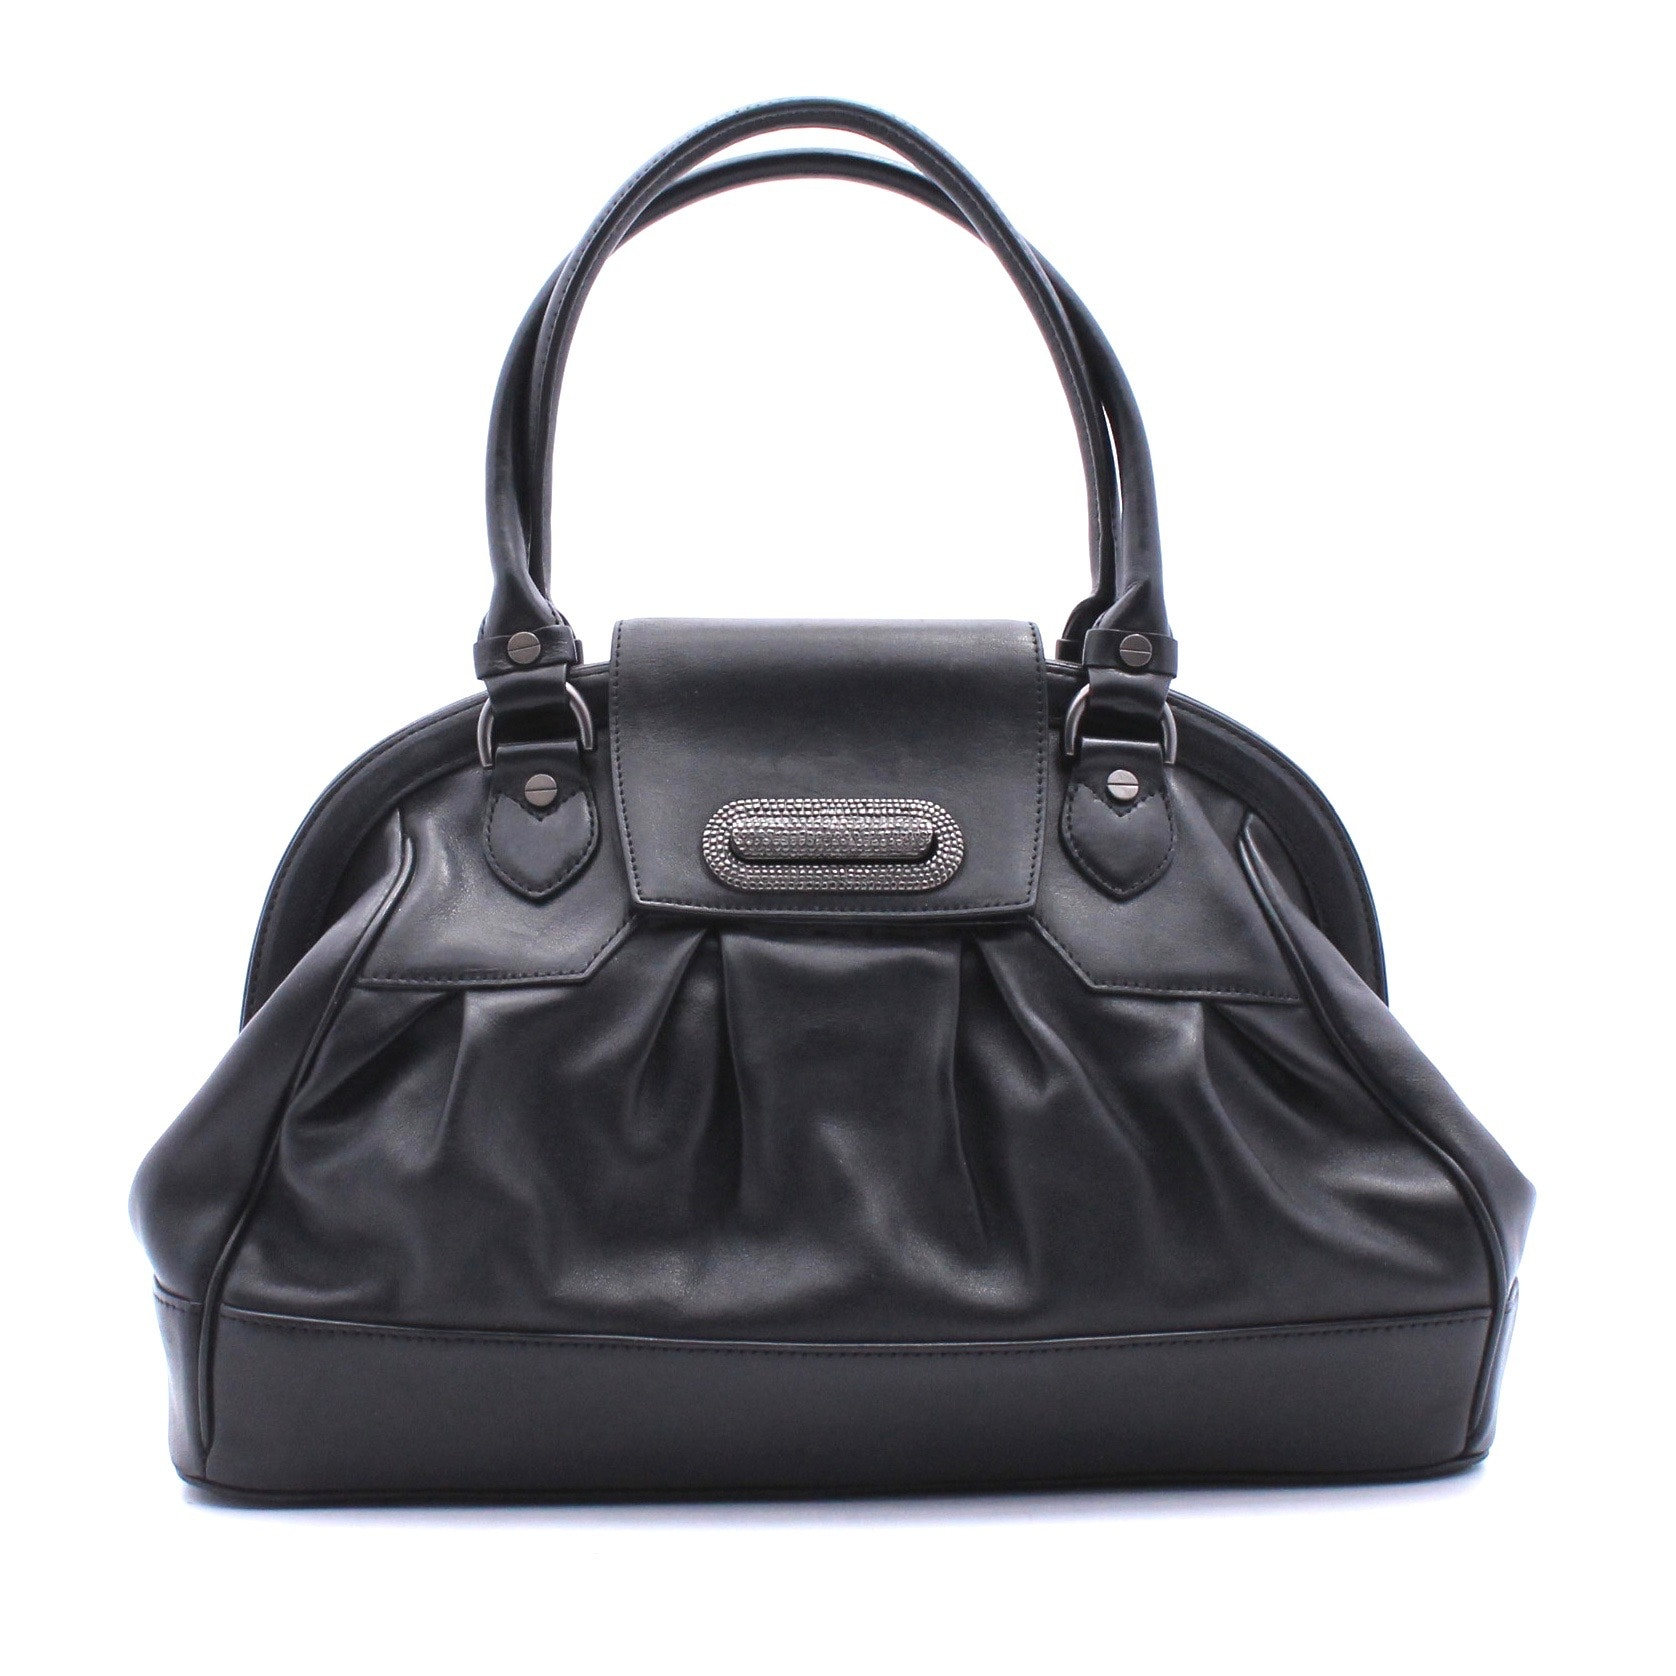 Alexis Hudson Black Leather Handbag